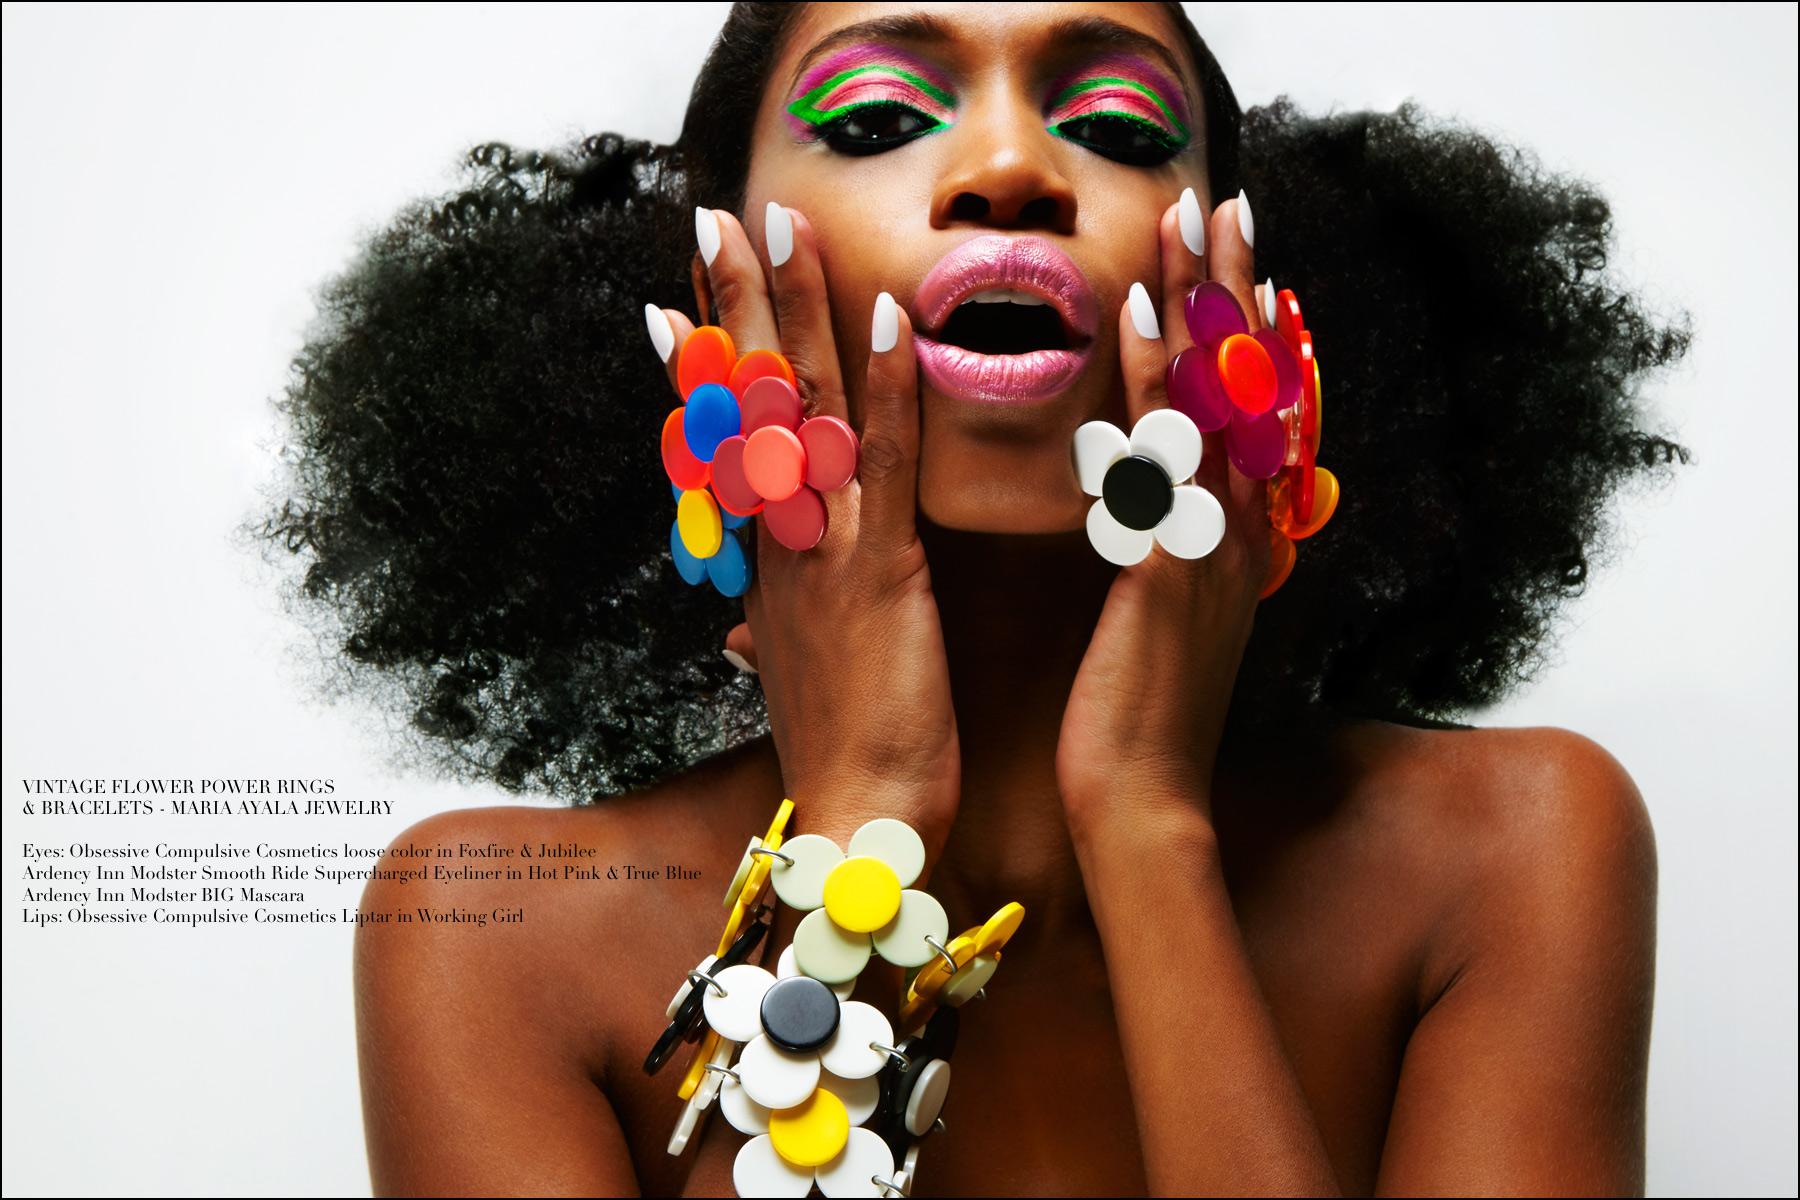 Model Christina Anderson-McDonald